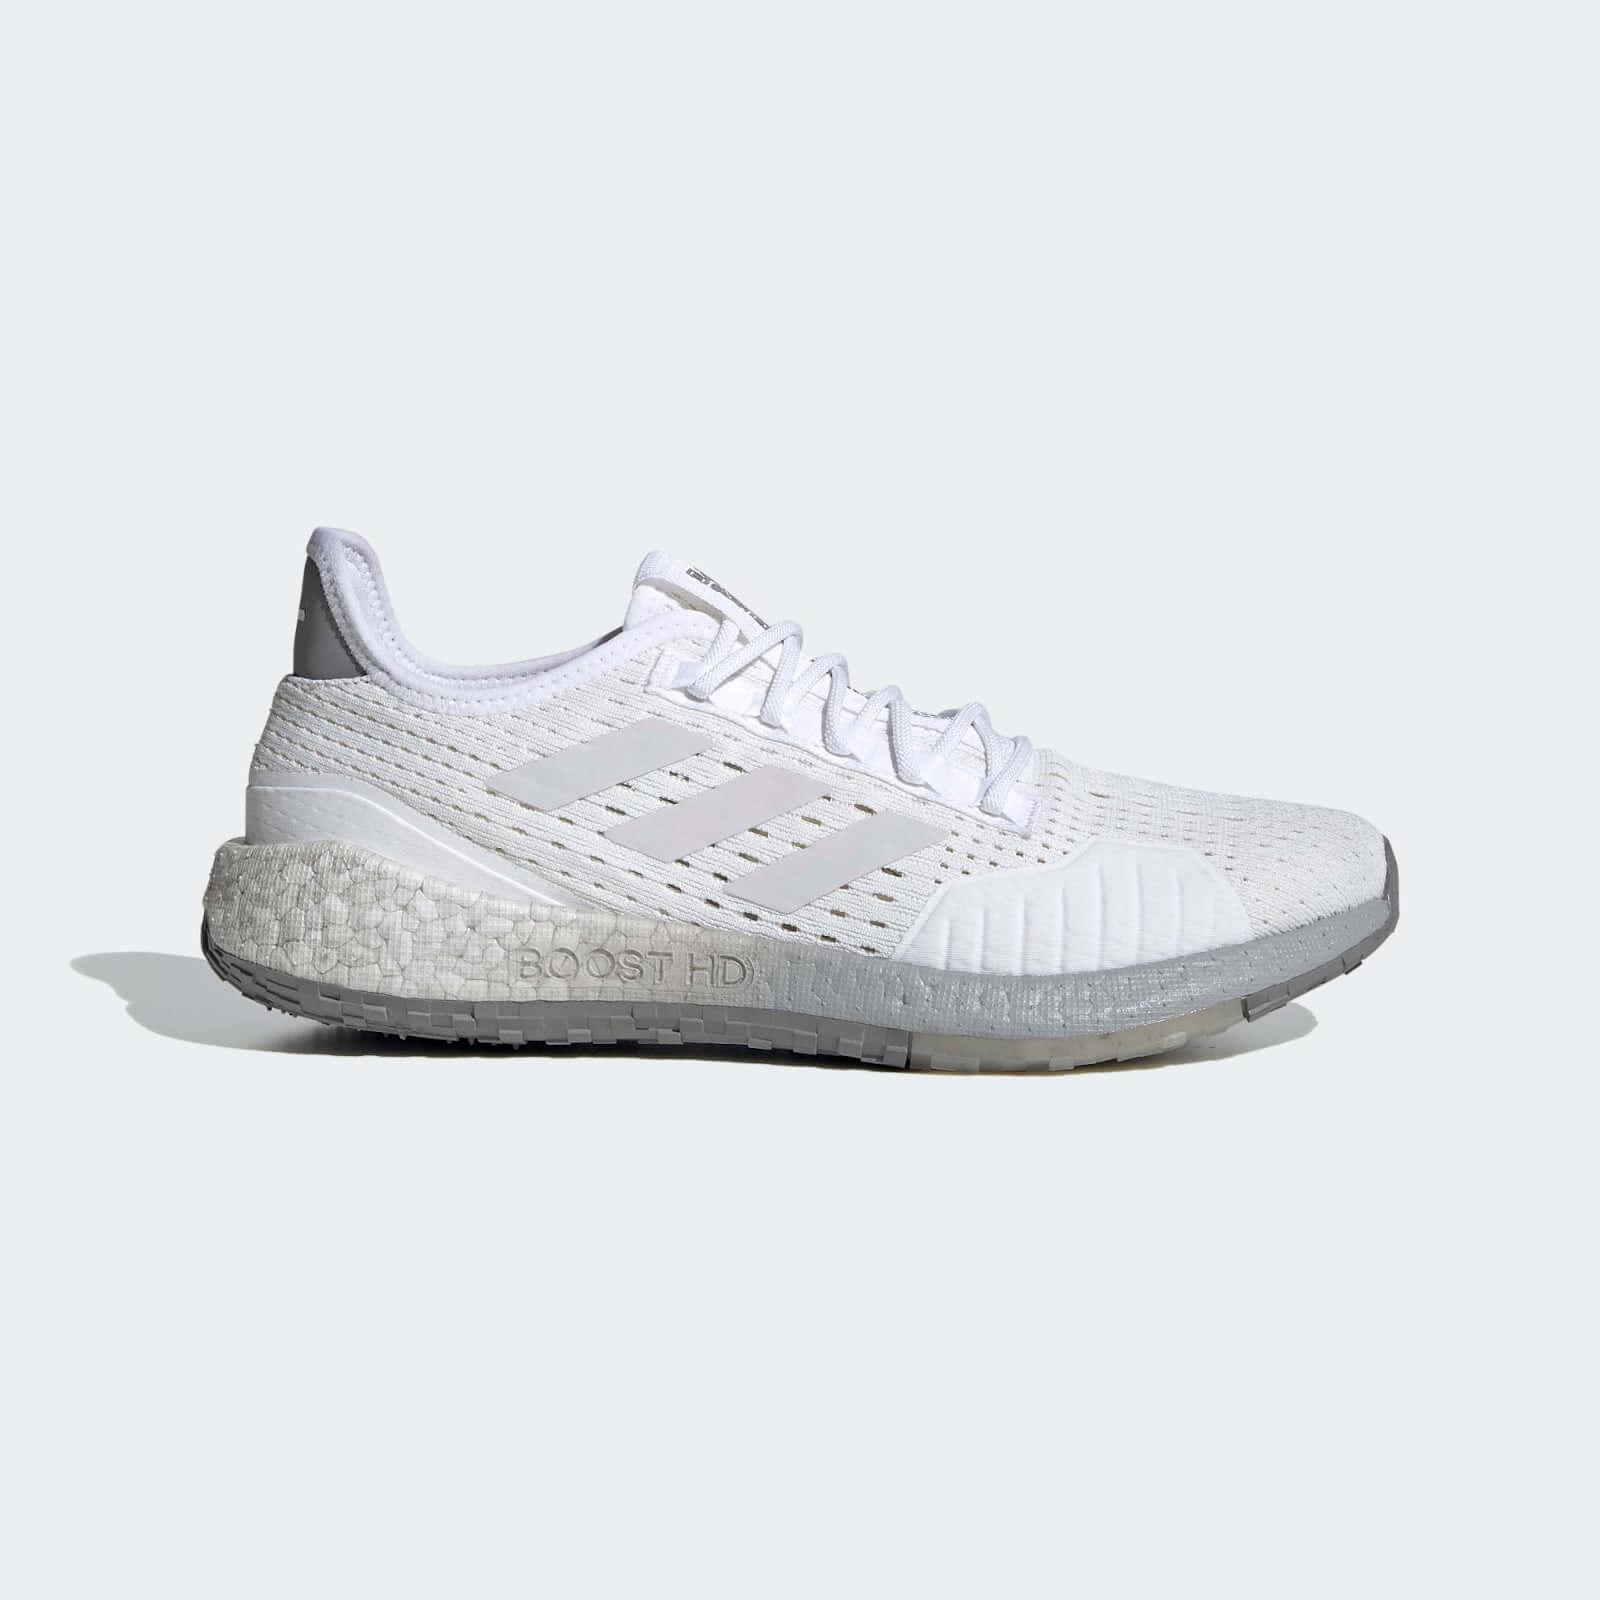 adidas PulseBoost HD Running Shoes – Cloud White – US 10.5/UK 10